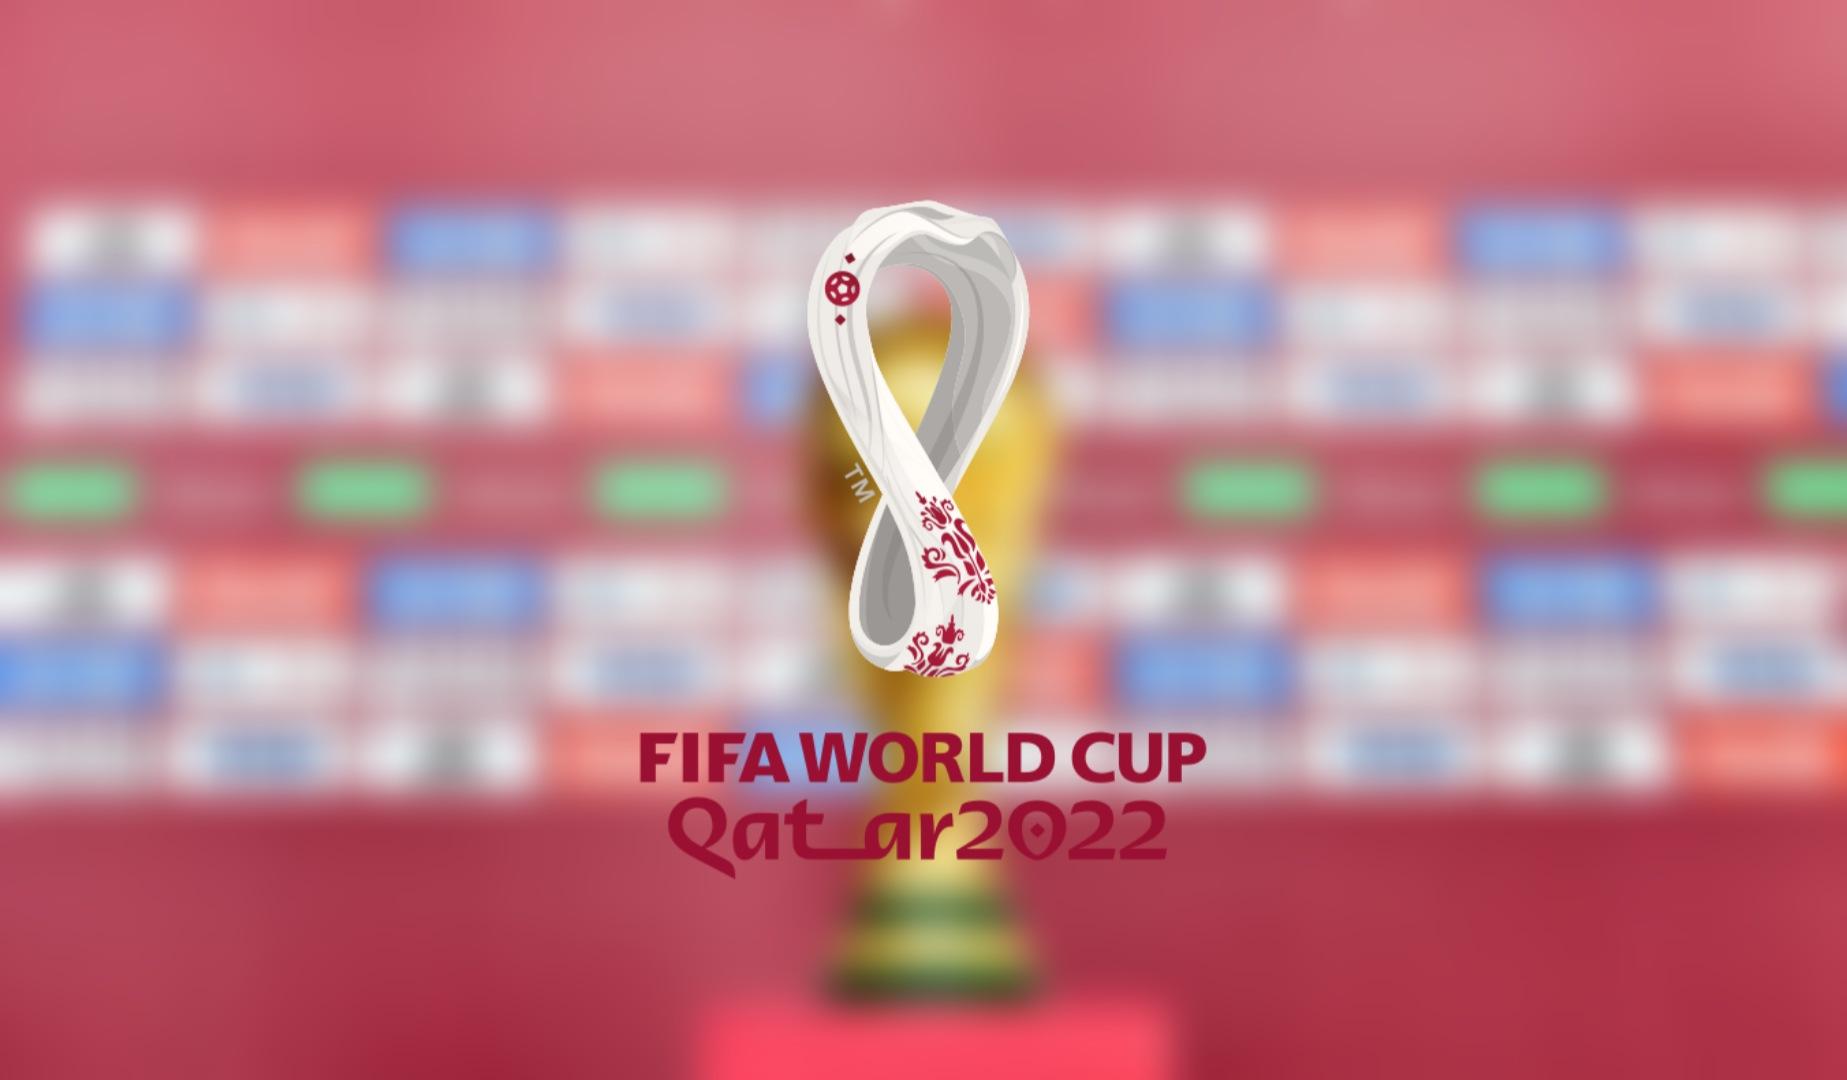 Jadual Siaran Langsung Piala Dunia 2022 Waktu Malaysia (RTM & Astro)